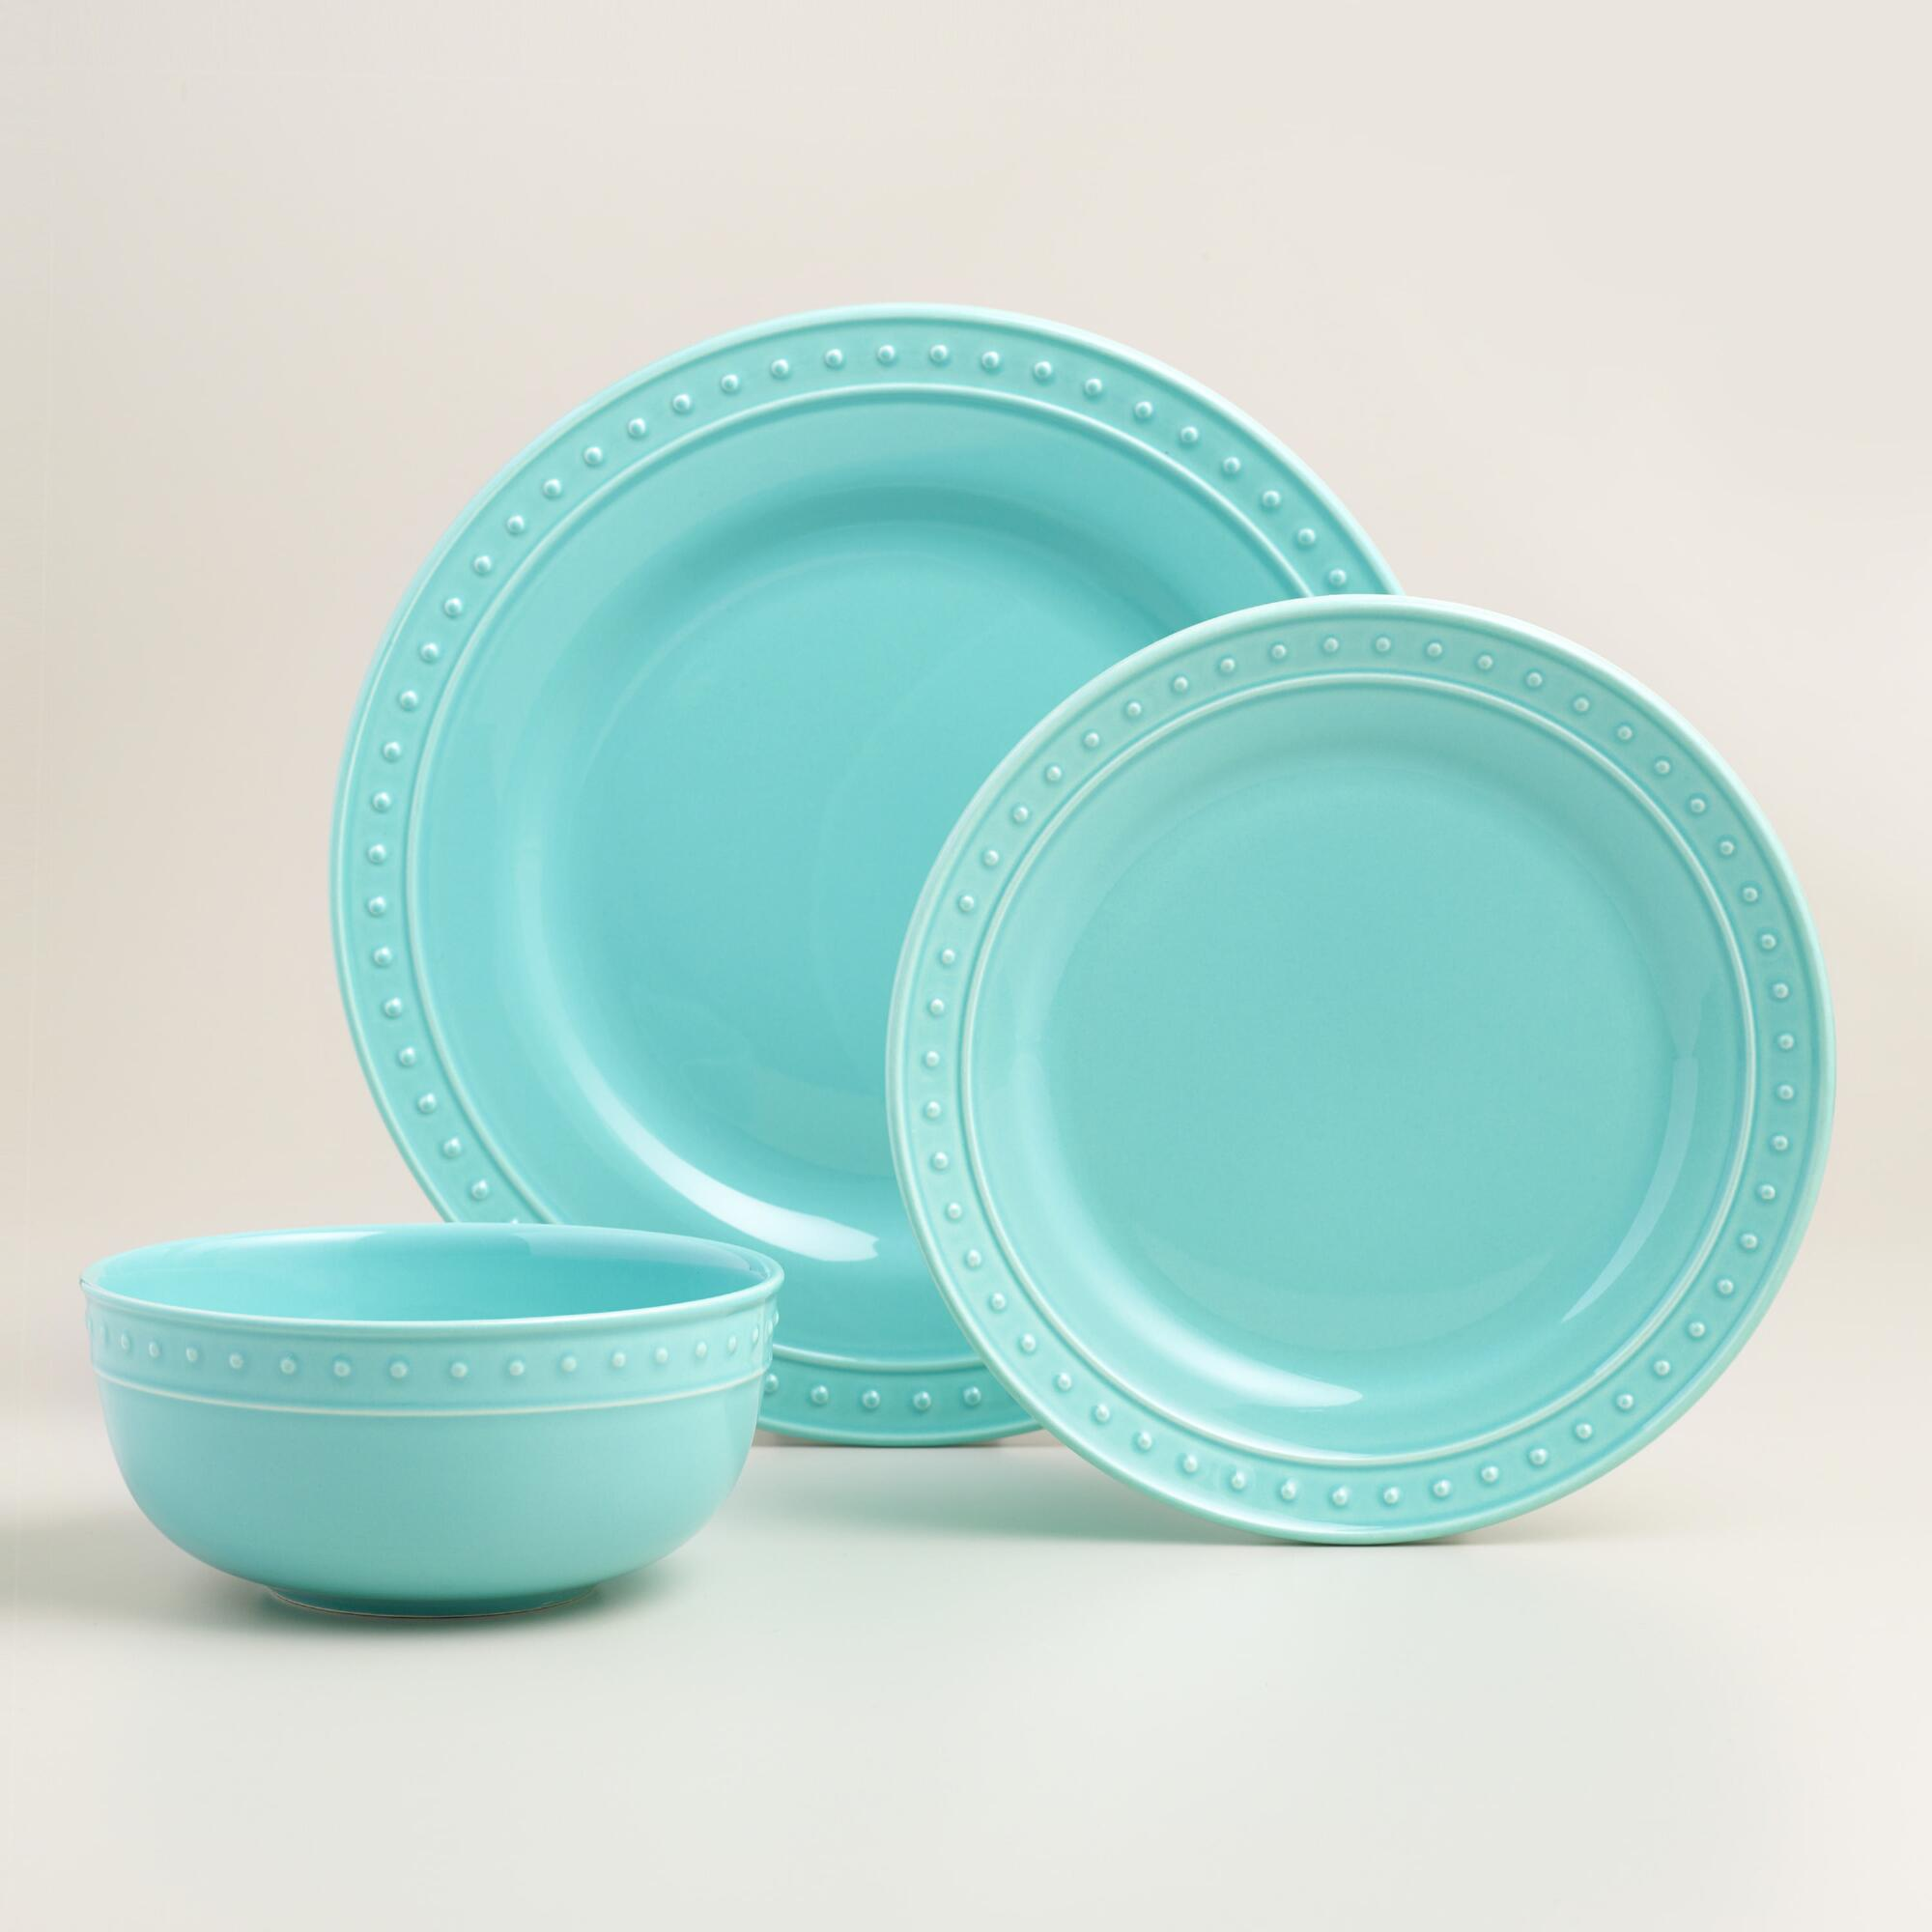 Aqua Nantucket Dinnerware & Aqua Nantucket Dinnerware | Everything Turquoise